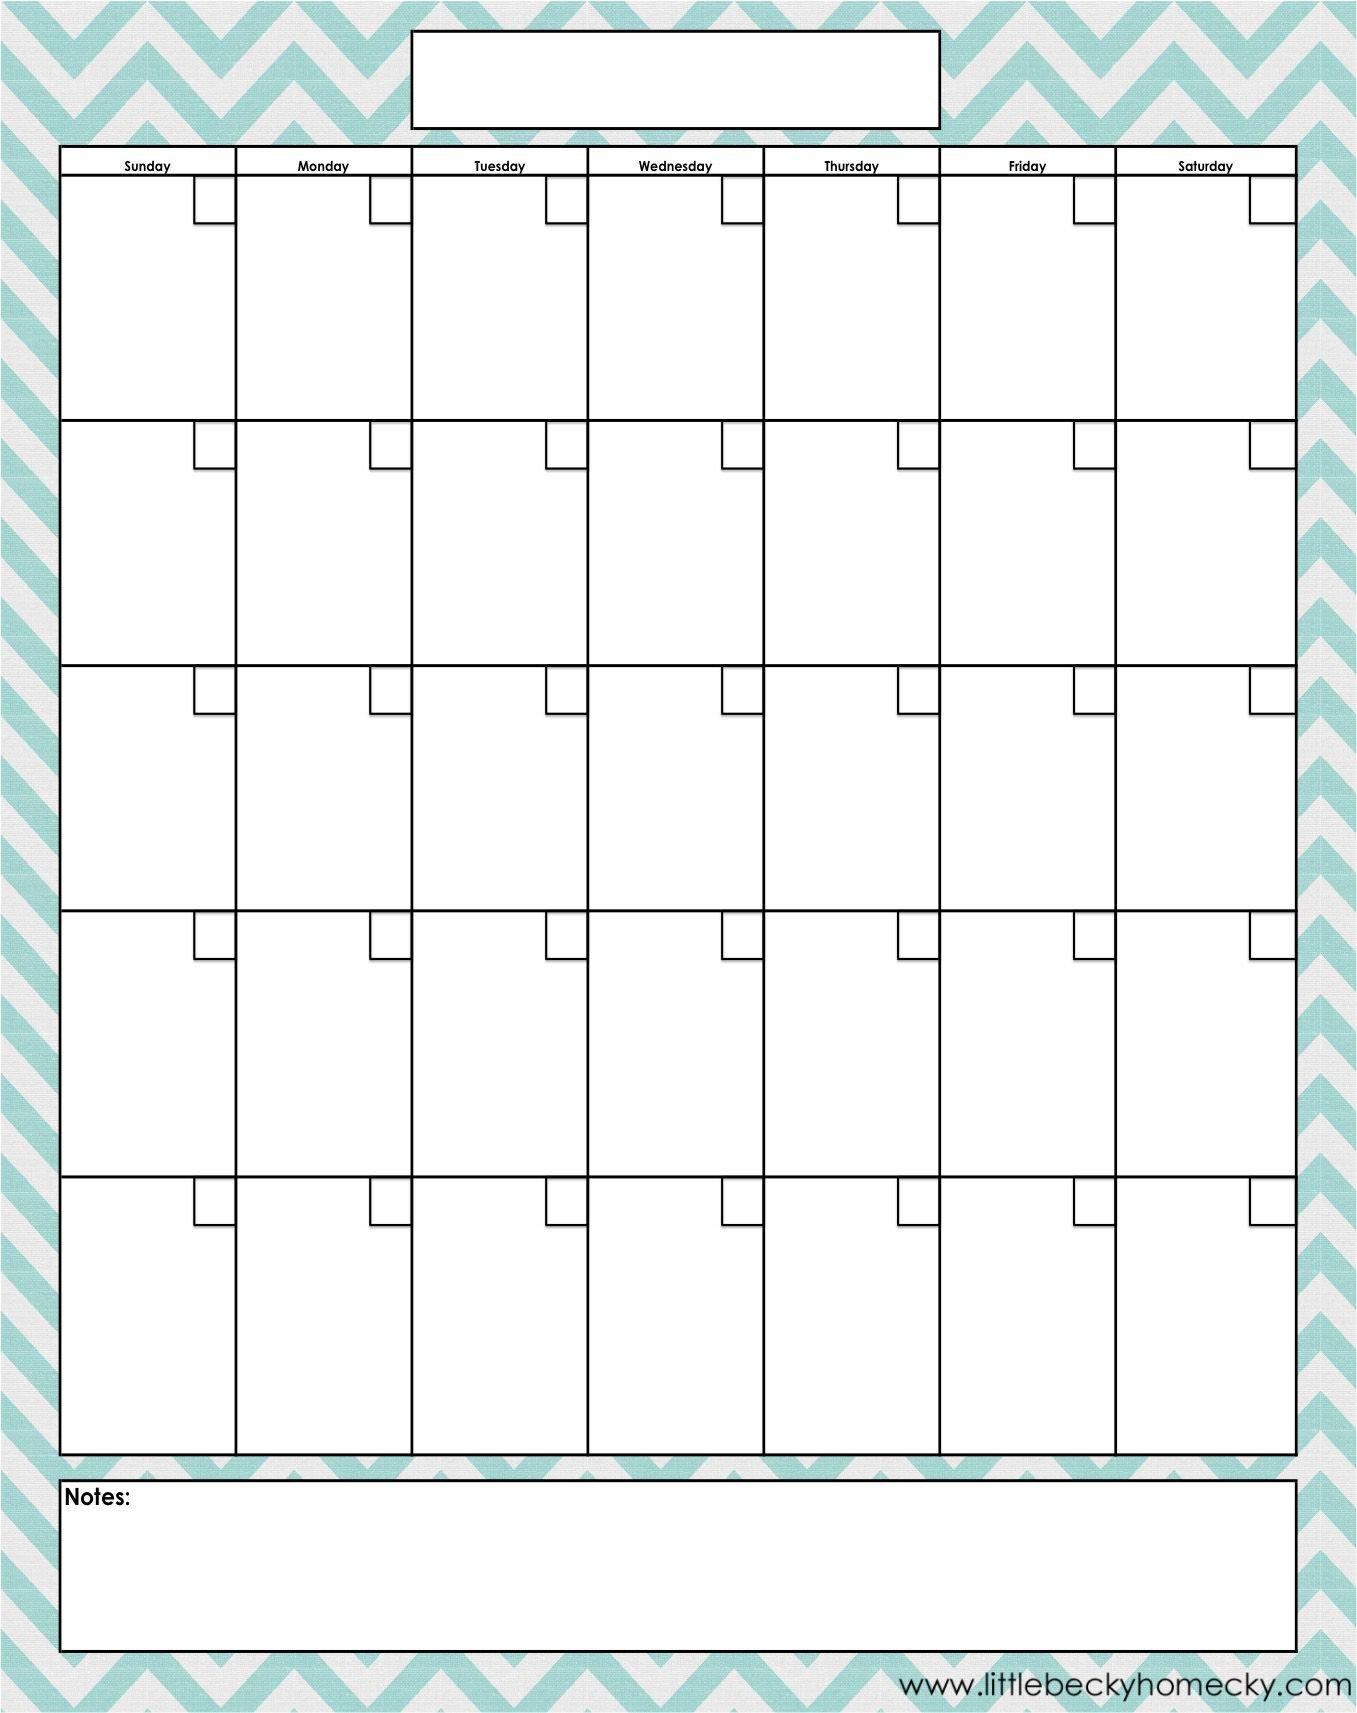 Blank Fill In Calendar   Calendar Template Printable Free Fill In Printable Calendars